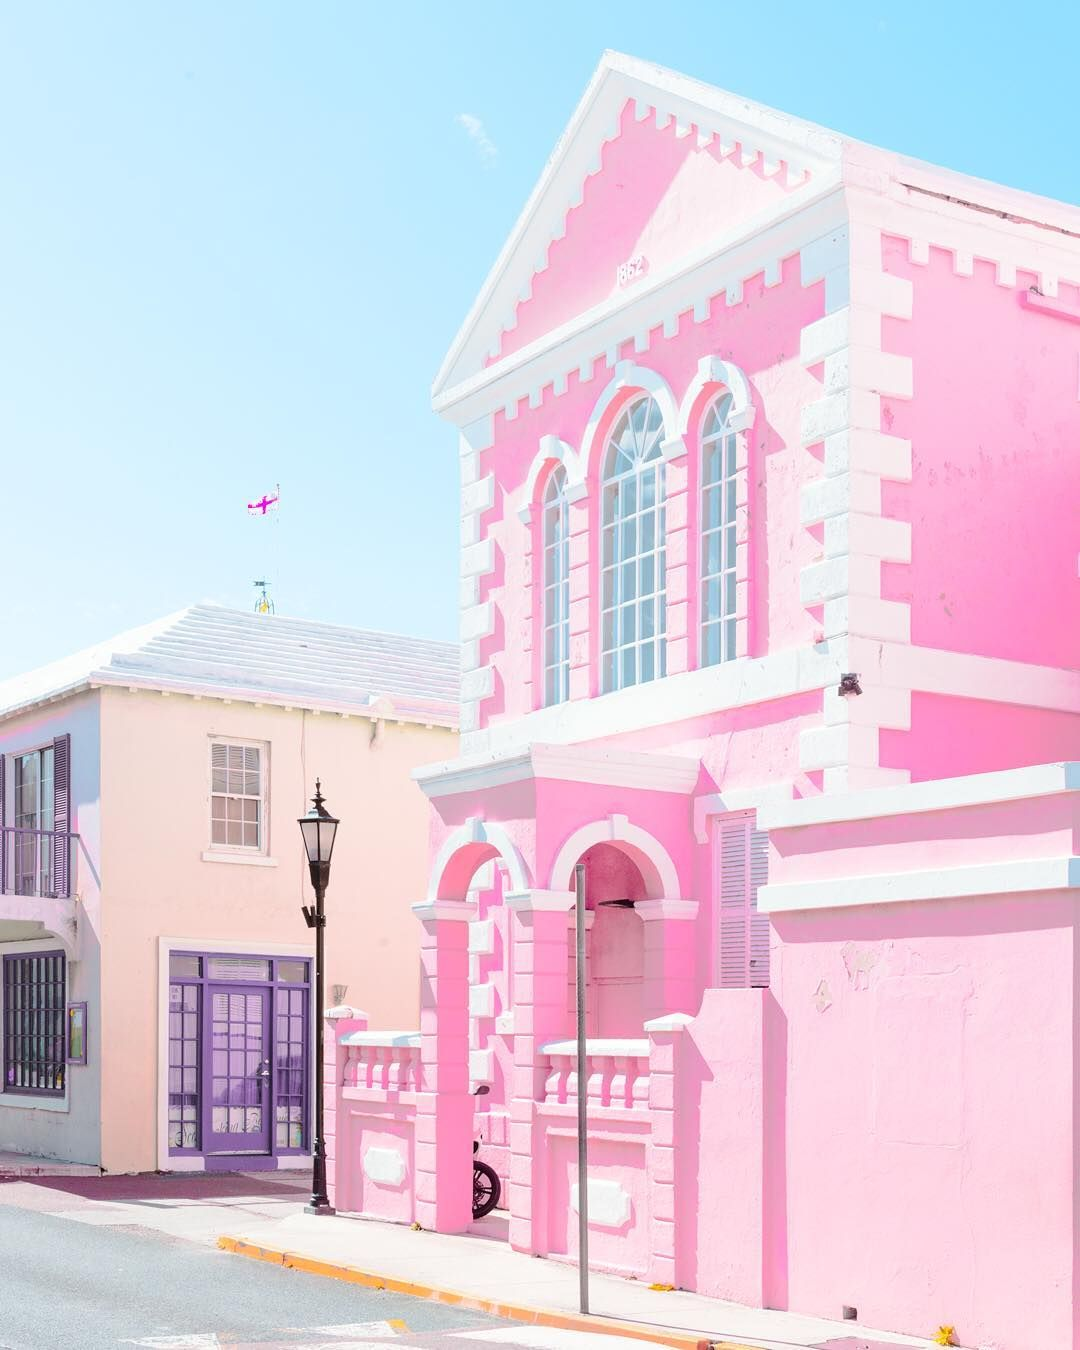 Stylequeen101.com | Exterior Design | Pinterest | Pastels, Pink ...